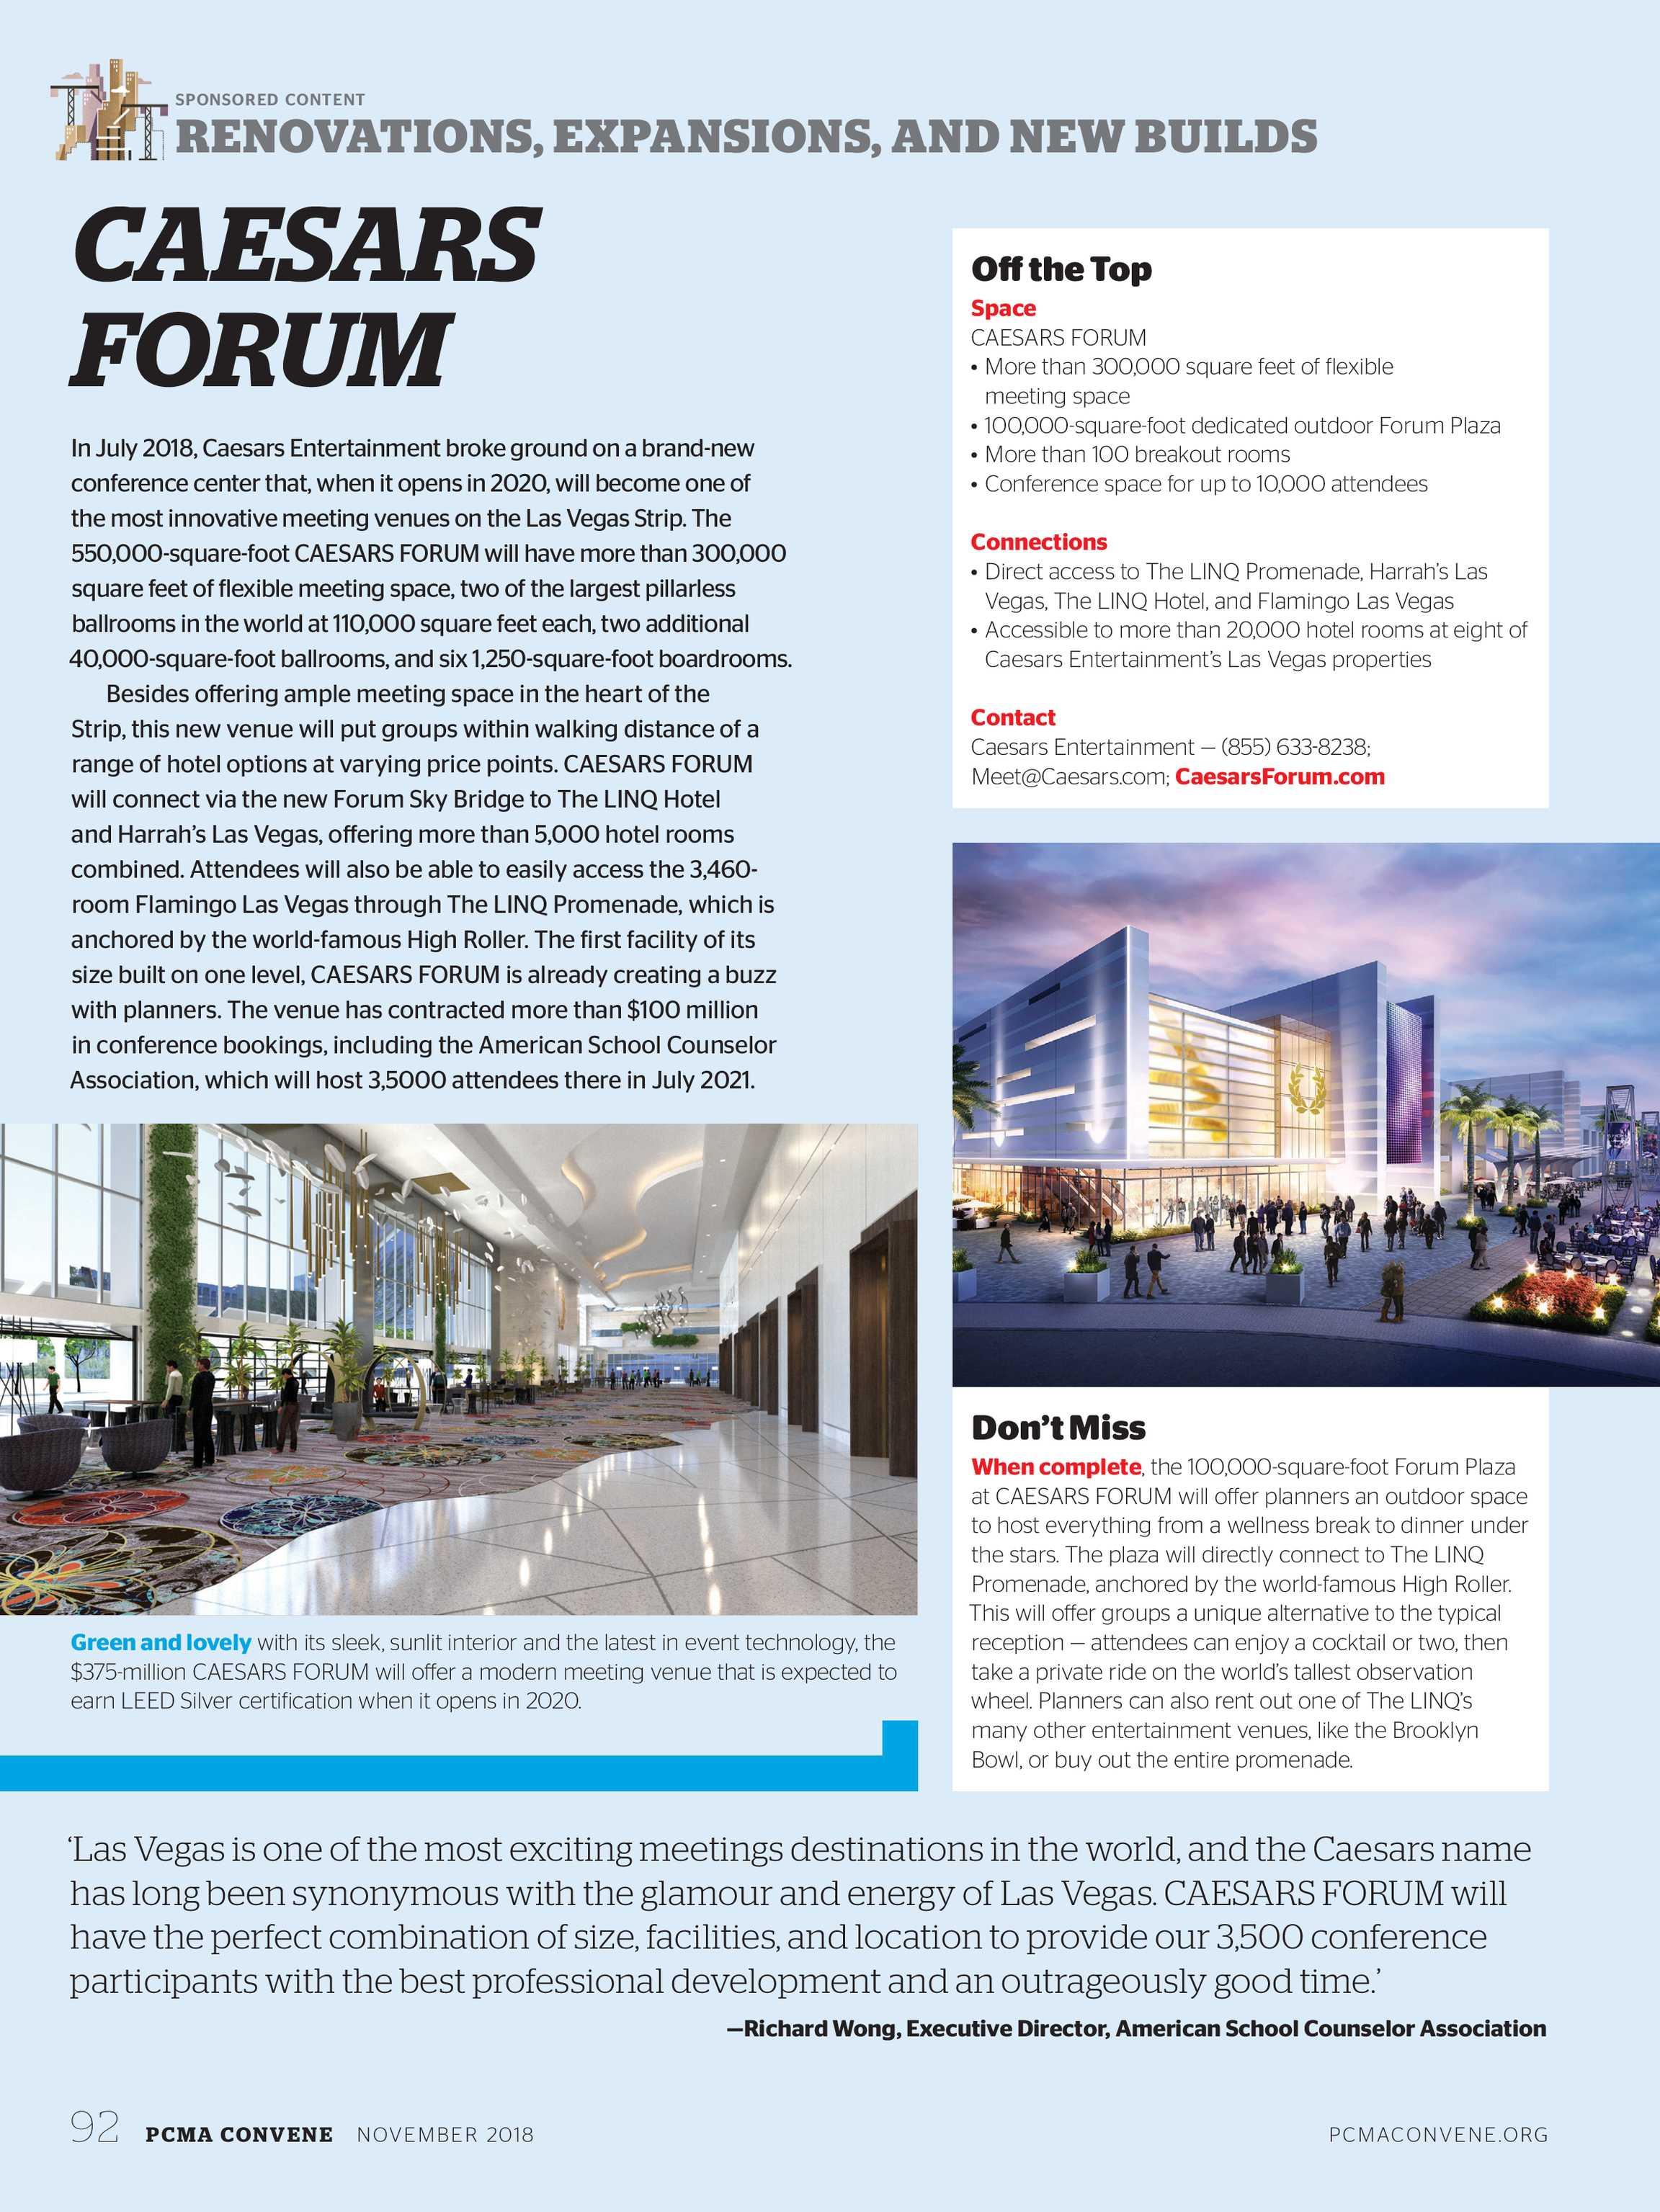 Convene - November 2018 - page 92